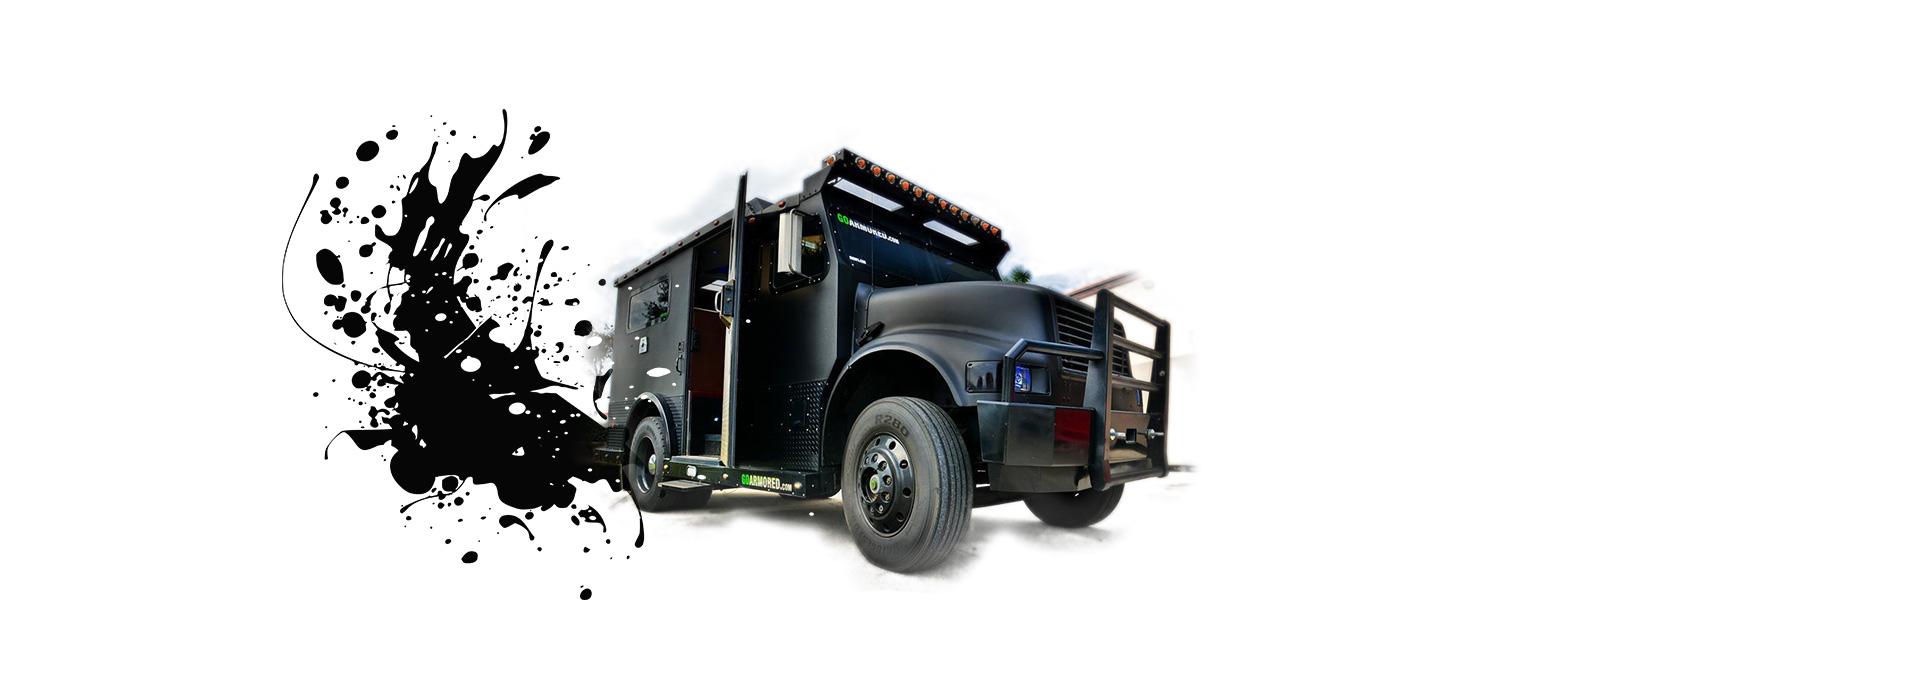 Custom specialty vehicles